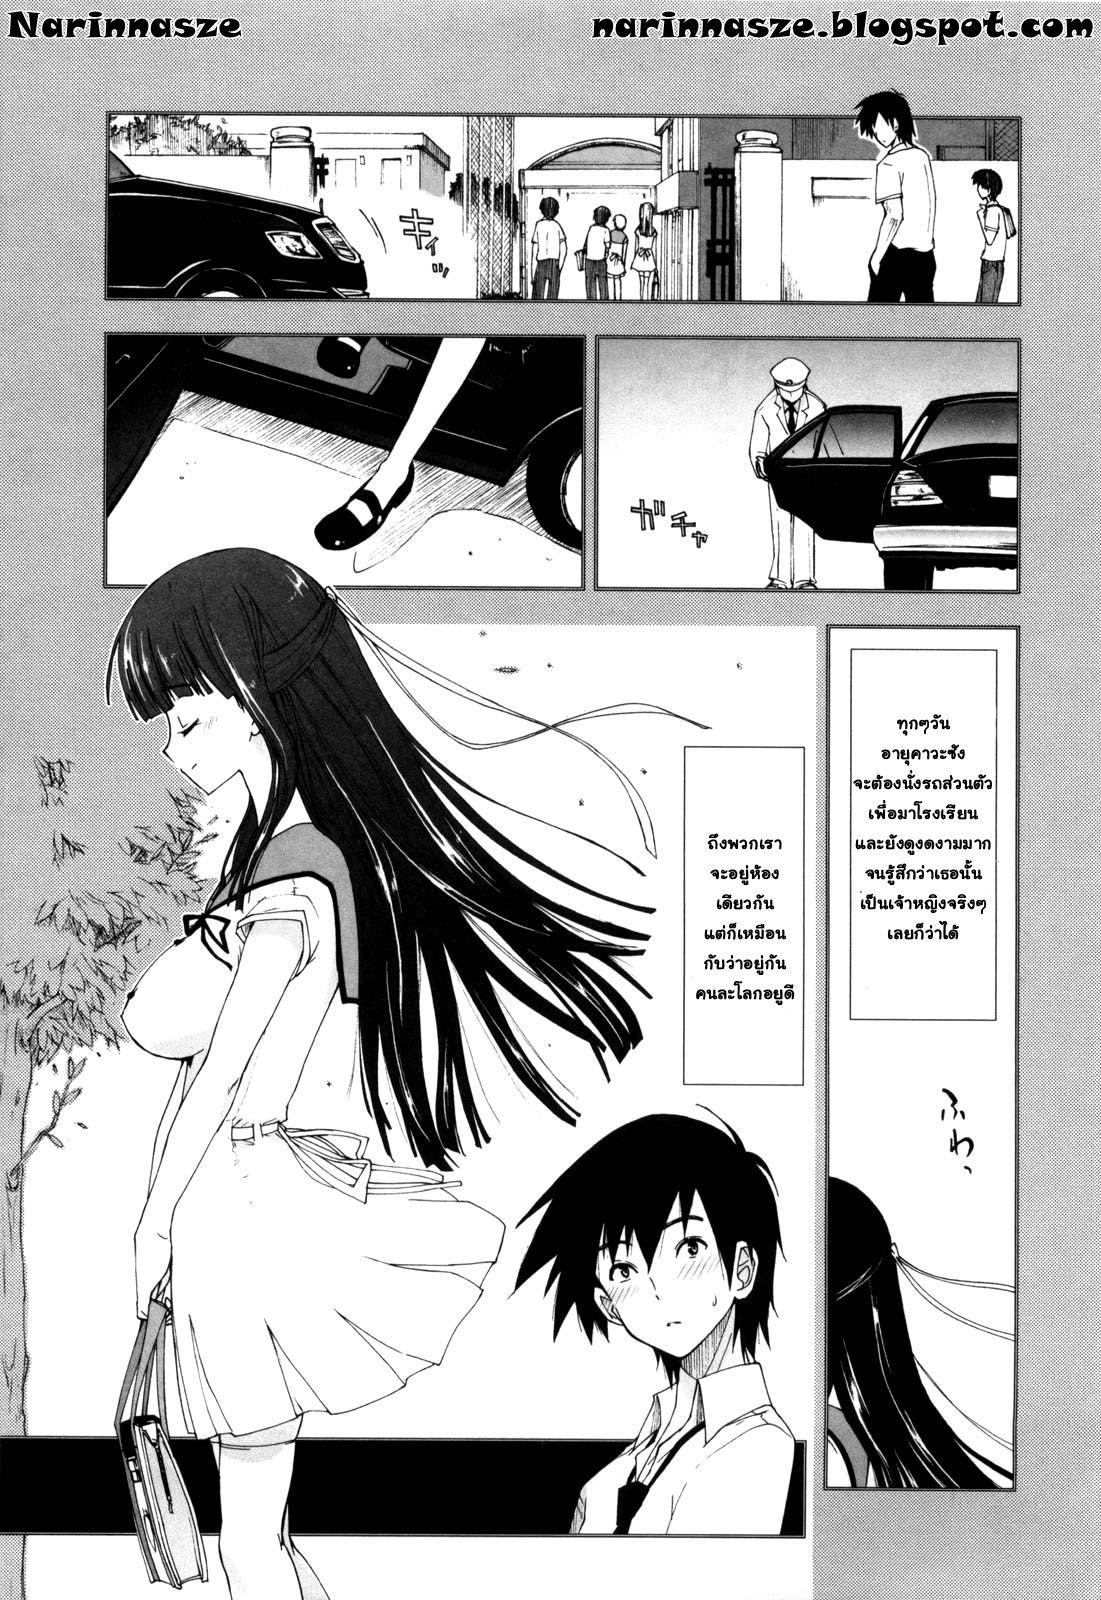 [Kamino Ryu-ya] Hajimete na Ojou-sama | คุณหนูไร้เดียงสา (Karadajuu, Nurunuru Desu. – My Whole Body Is Clammy.) [Thai ภาษาไทย] {narinnasze} [Decensored]